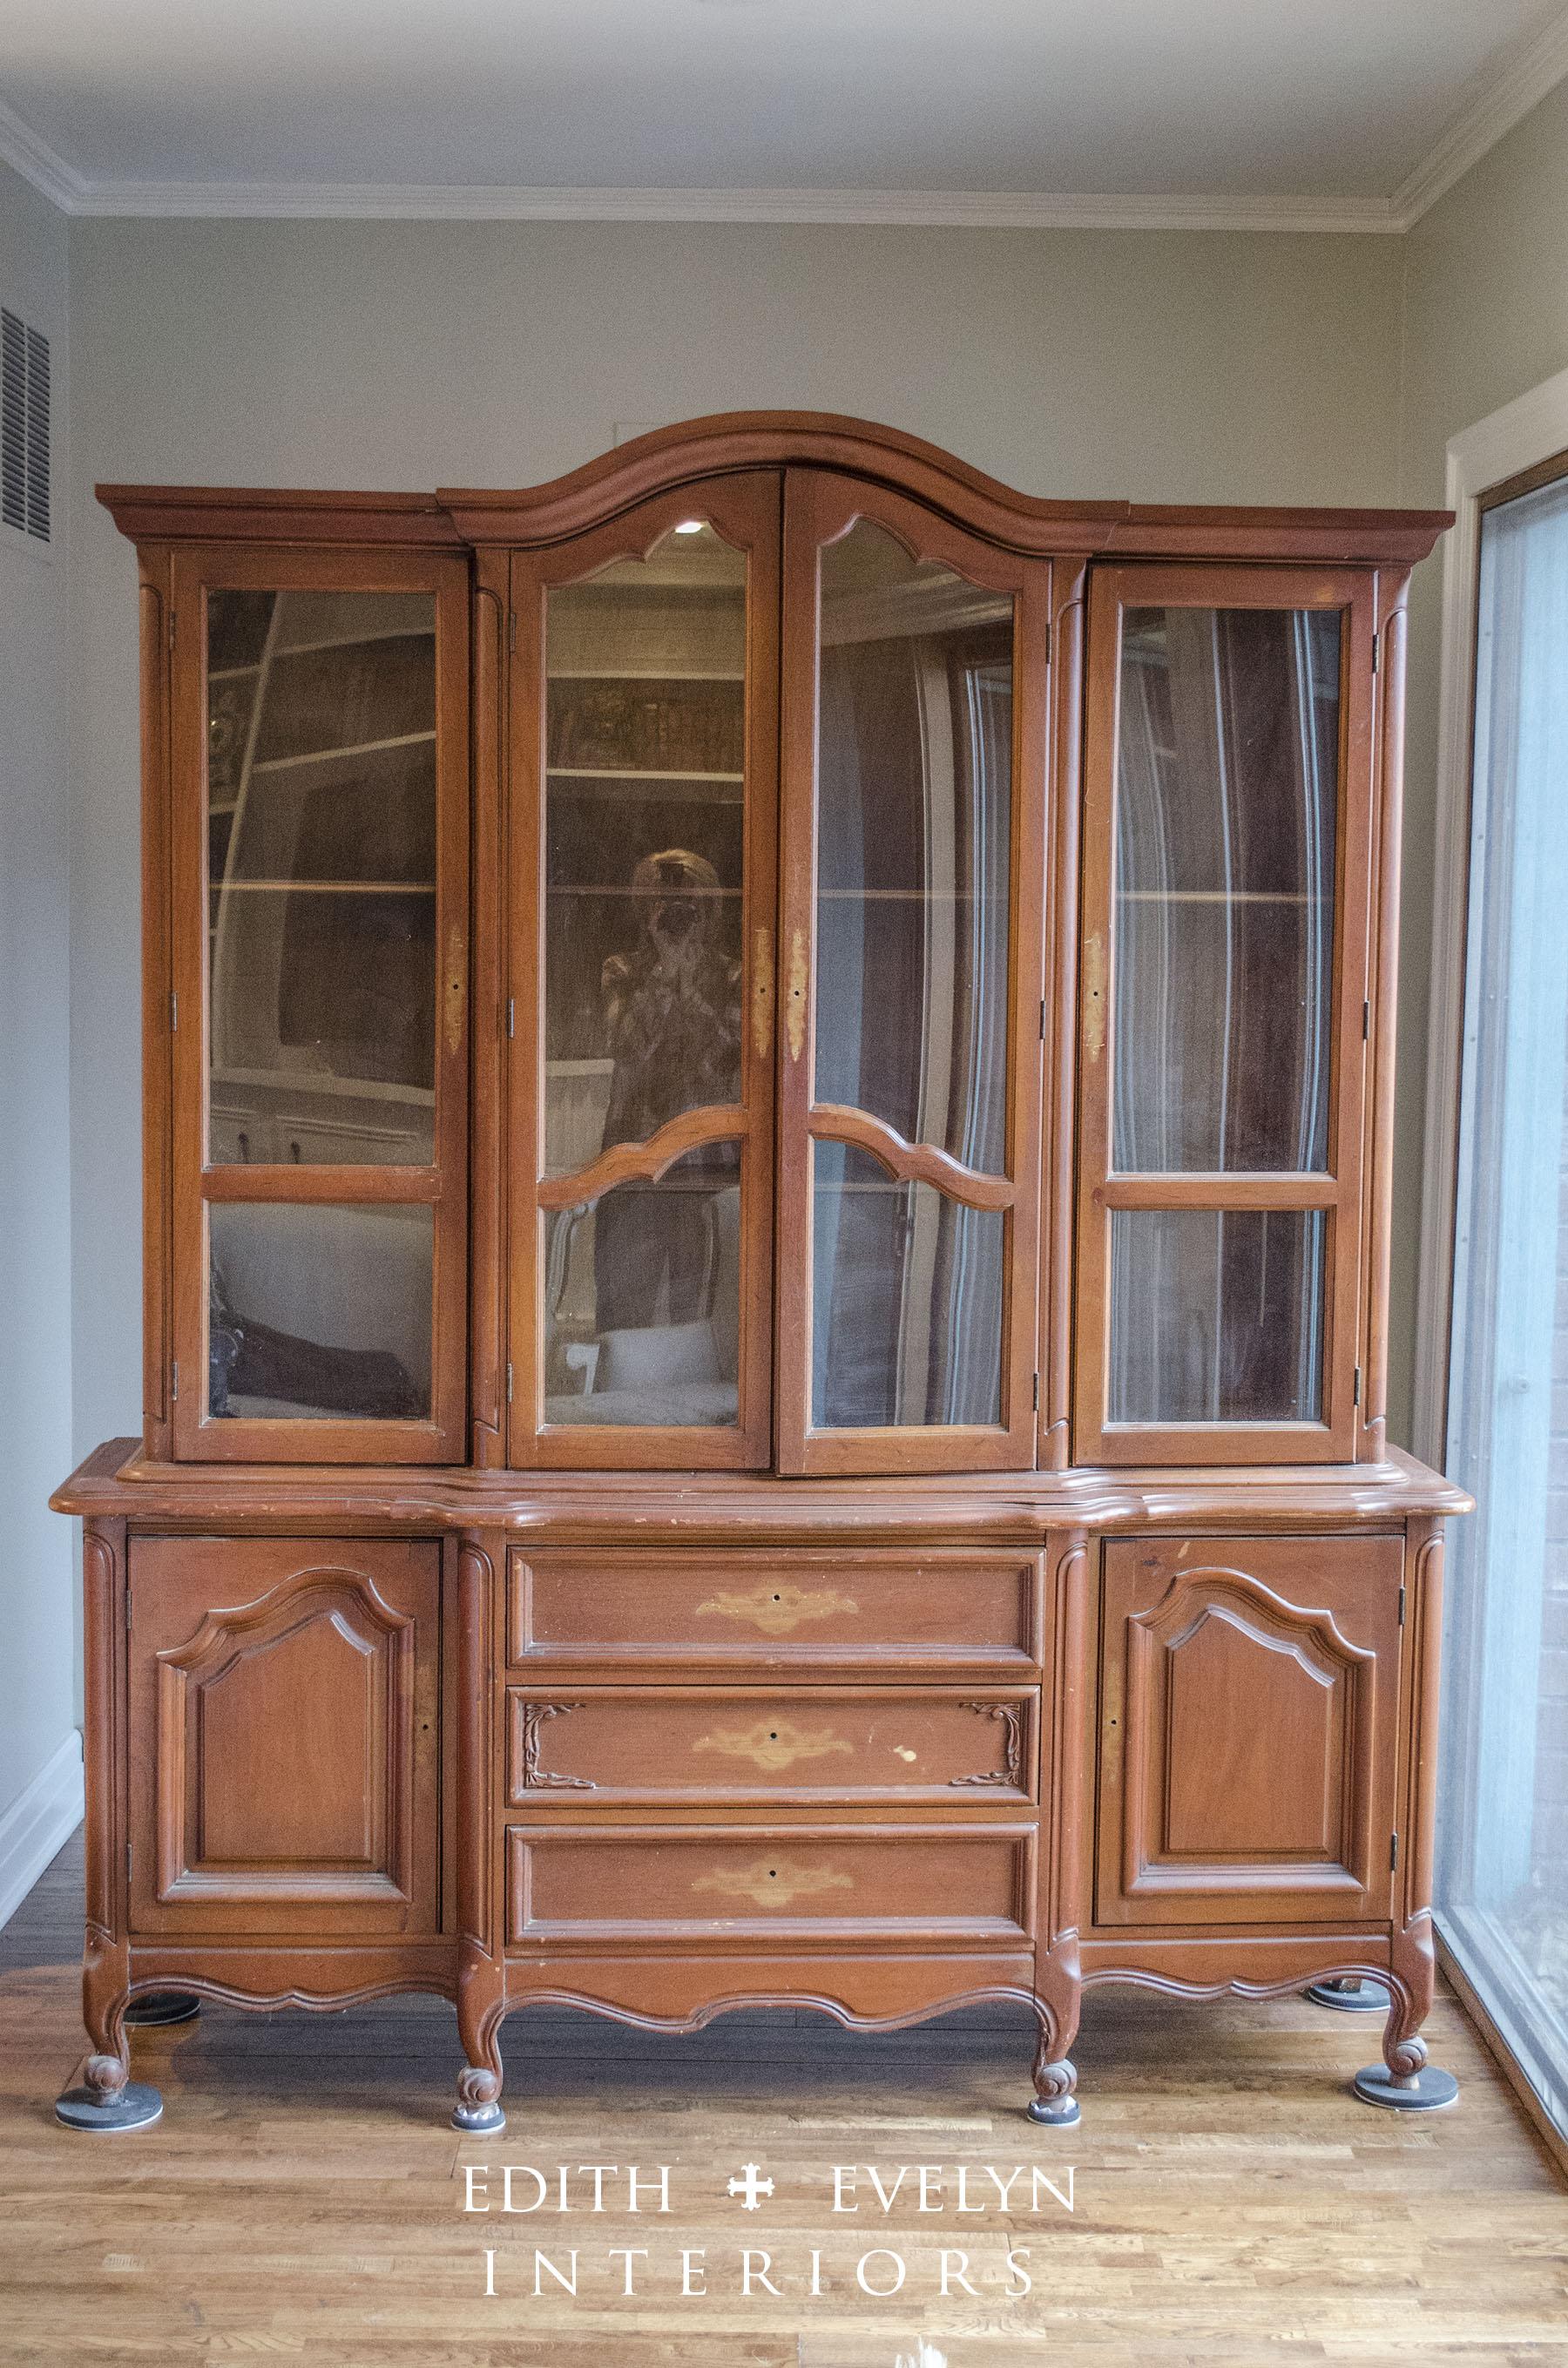 aubusson blue archives edith evelyn vintage. Black Bedroom Furniture Sets. Home Design Ideas